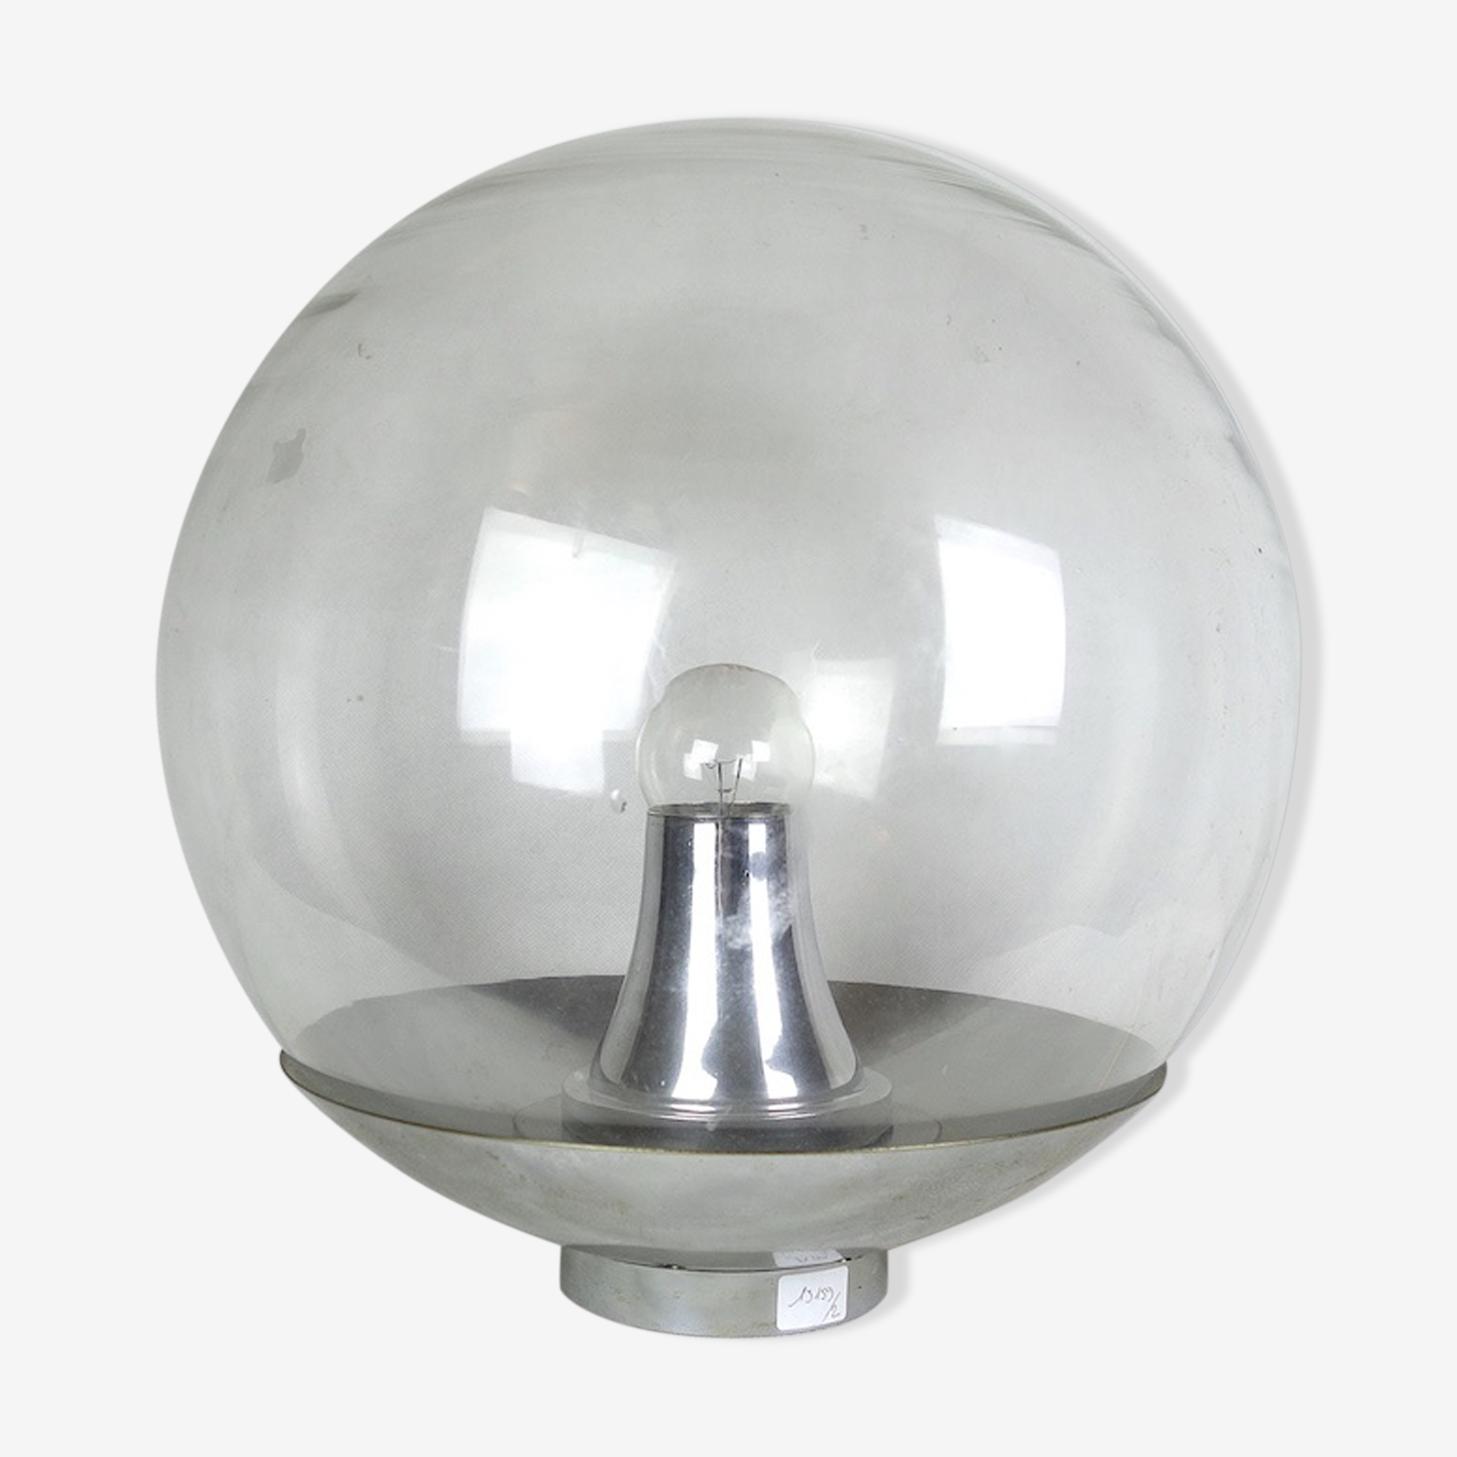 Vintage ball lamp 1950